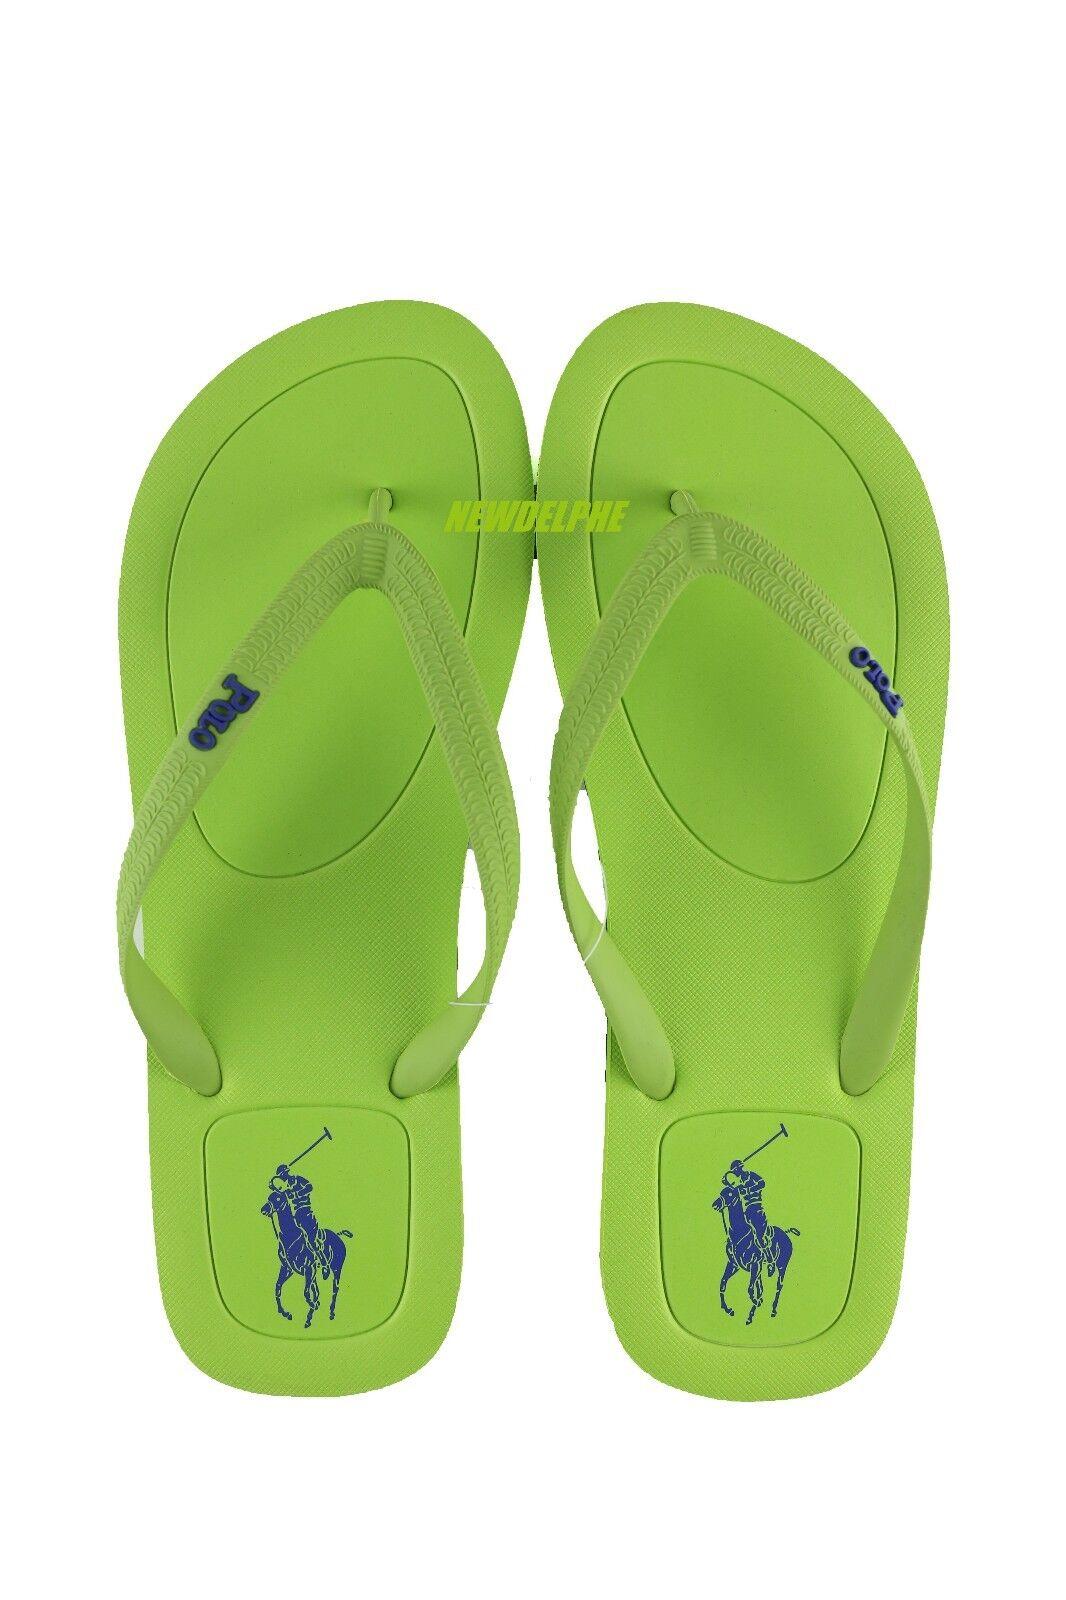 8297a0b0d95b NWT Polo Ralph Lauren Men Big Pony HALESOWEN HALESOWEN HALESOWEN Flip-Flop  Sandals Slipper Shoes 299671